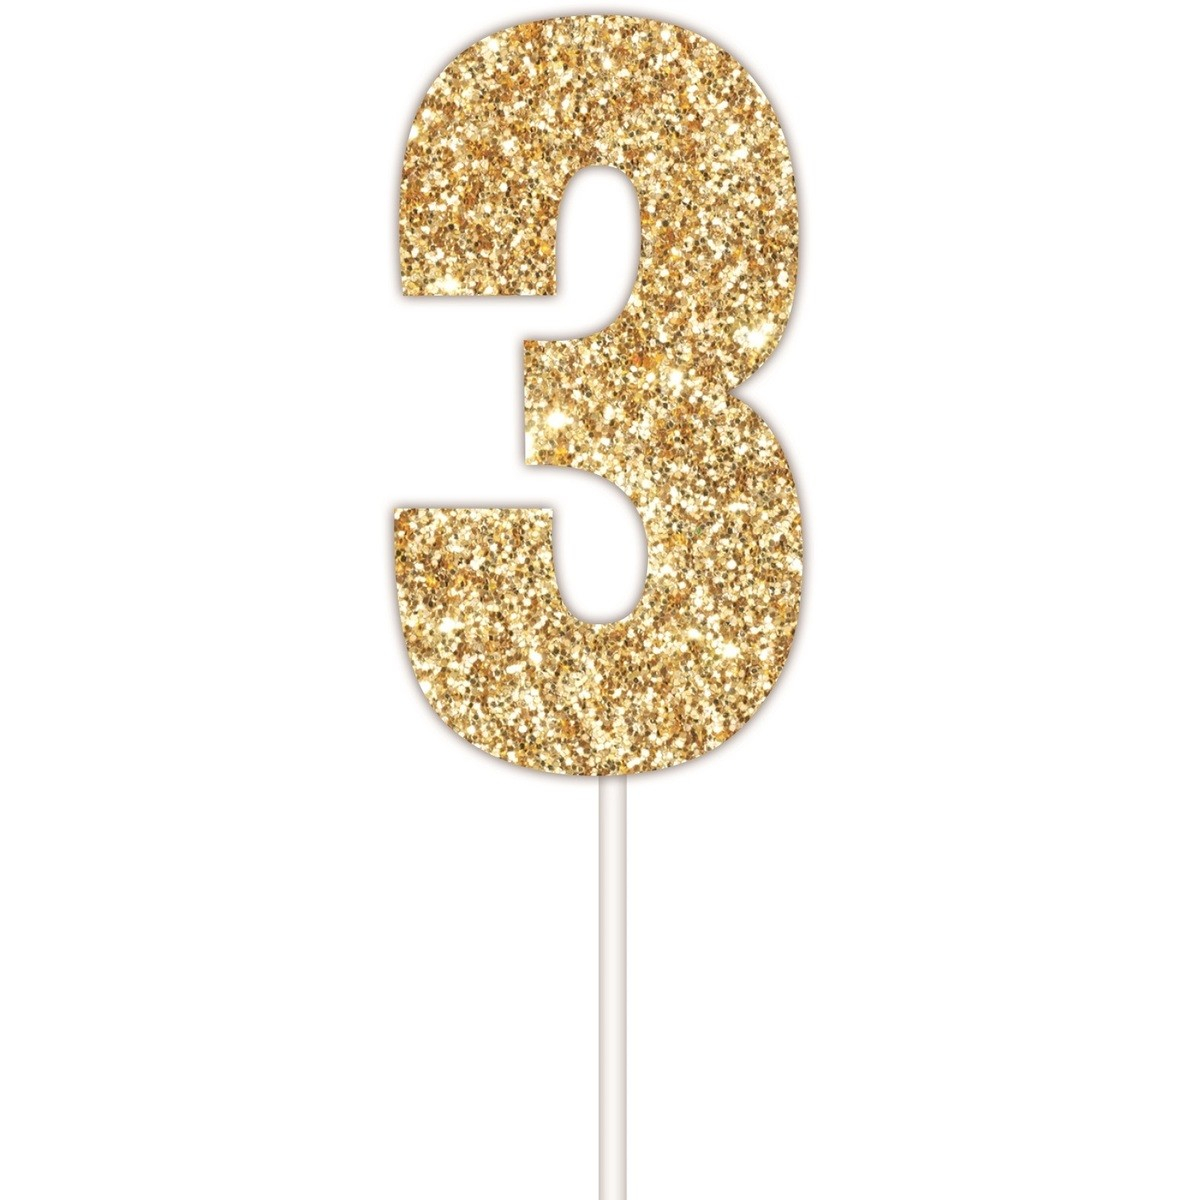 Artwrap Number 3 Glitter Cake Topper Gold BIG W